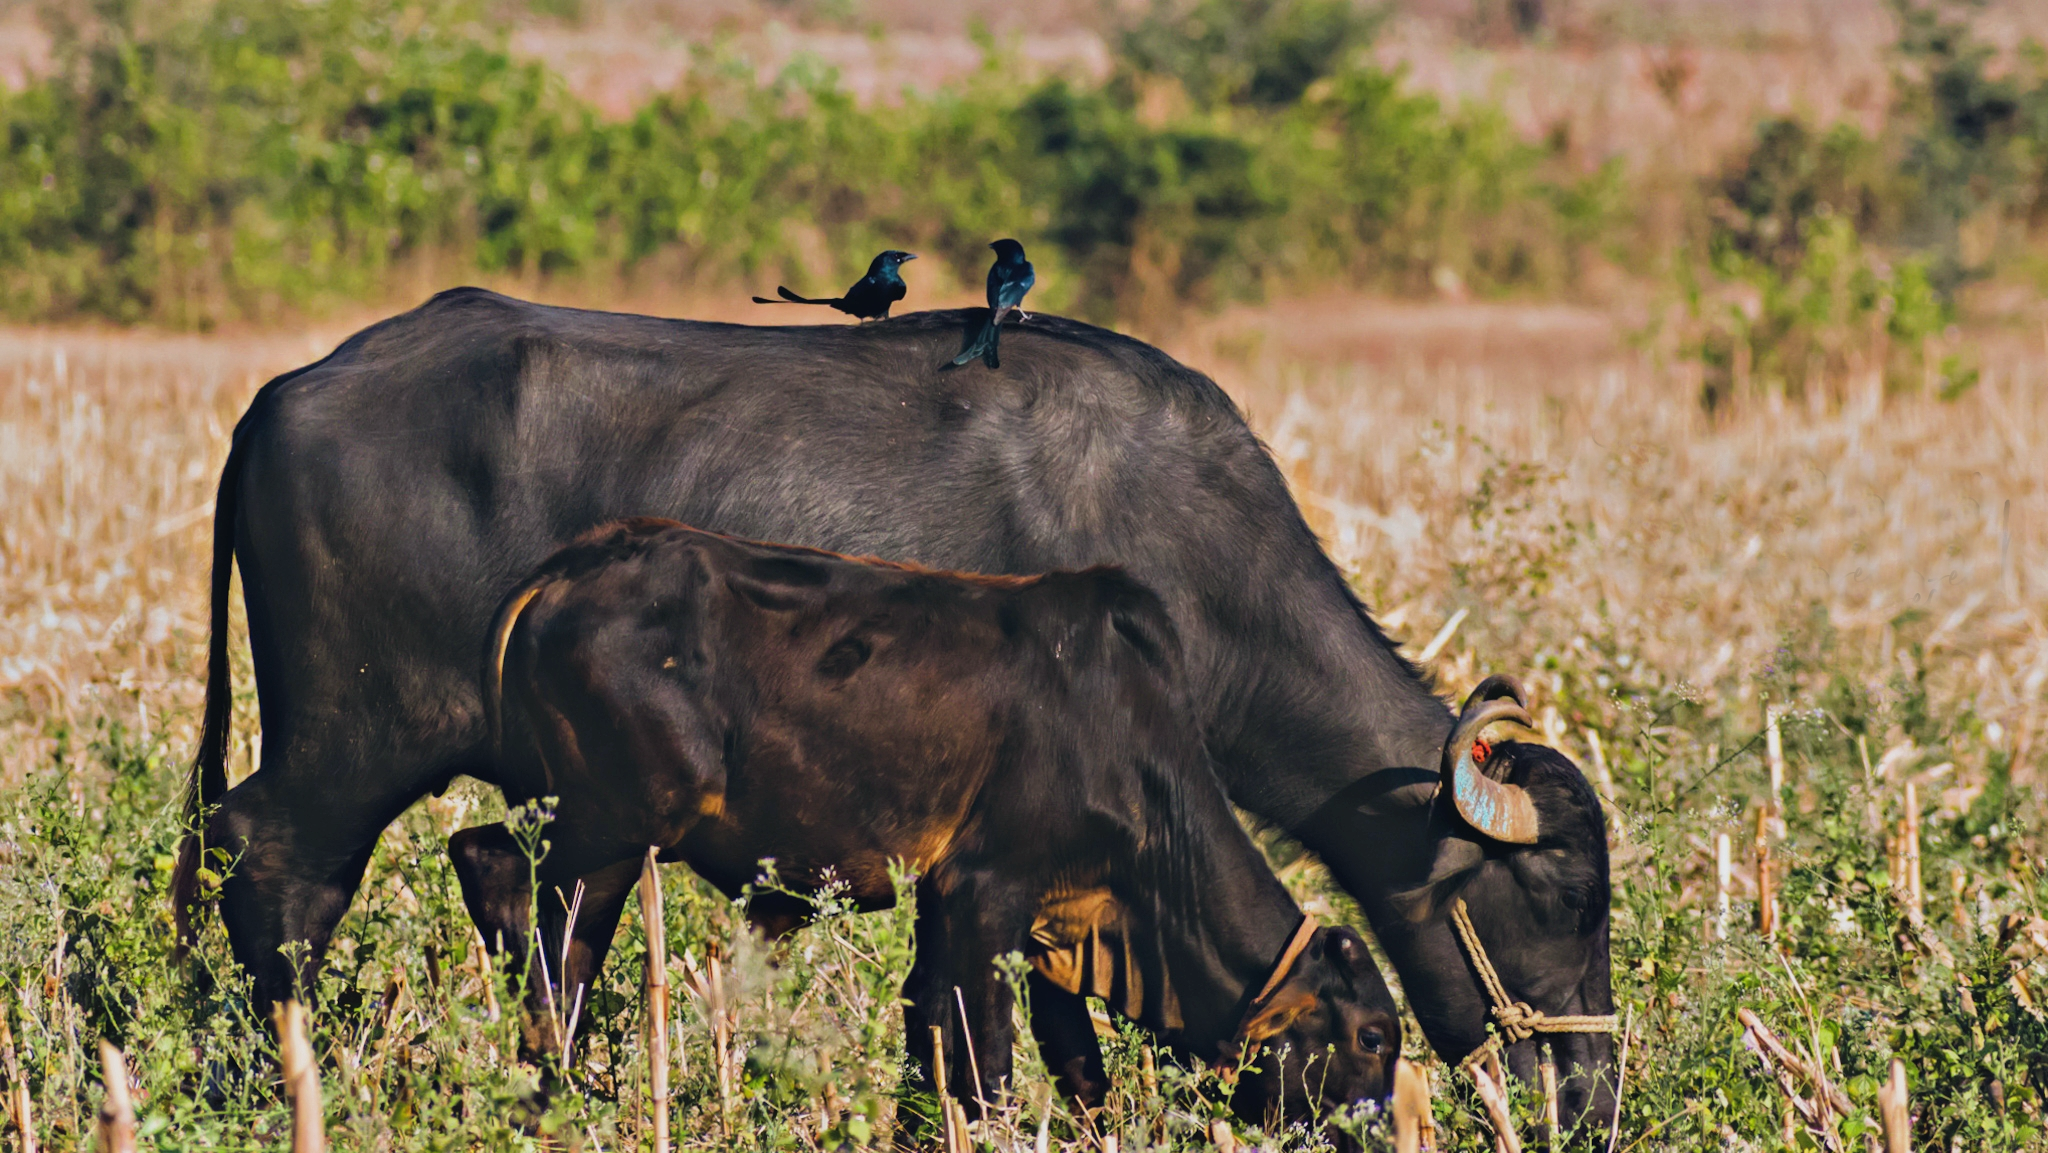 Domestic animals grazing in a field